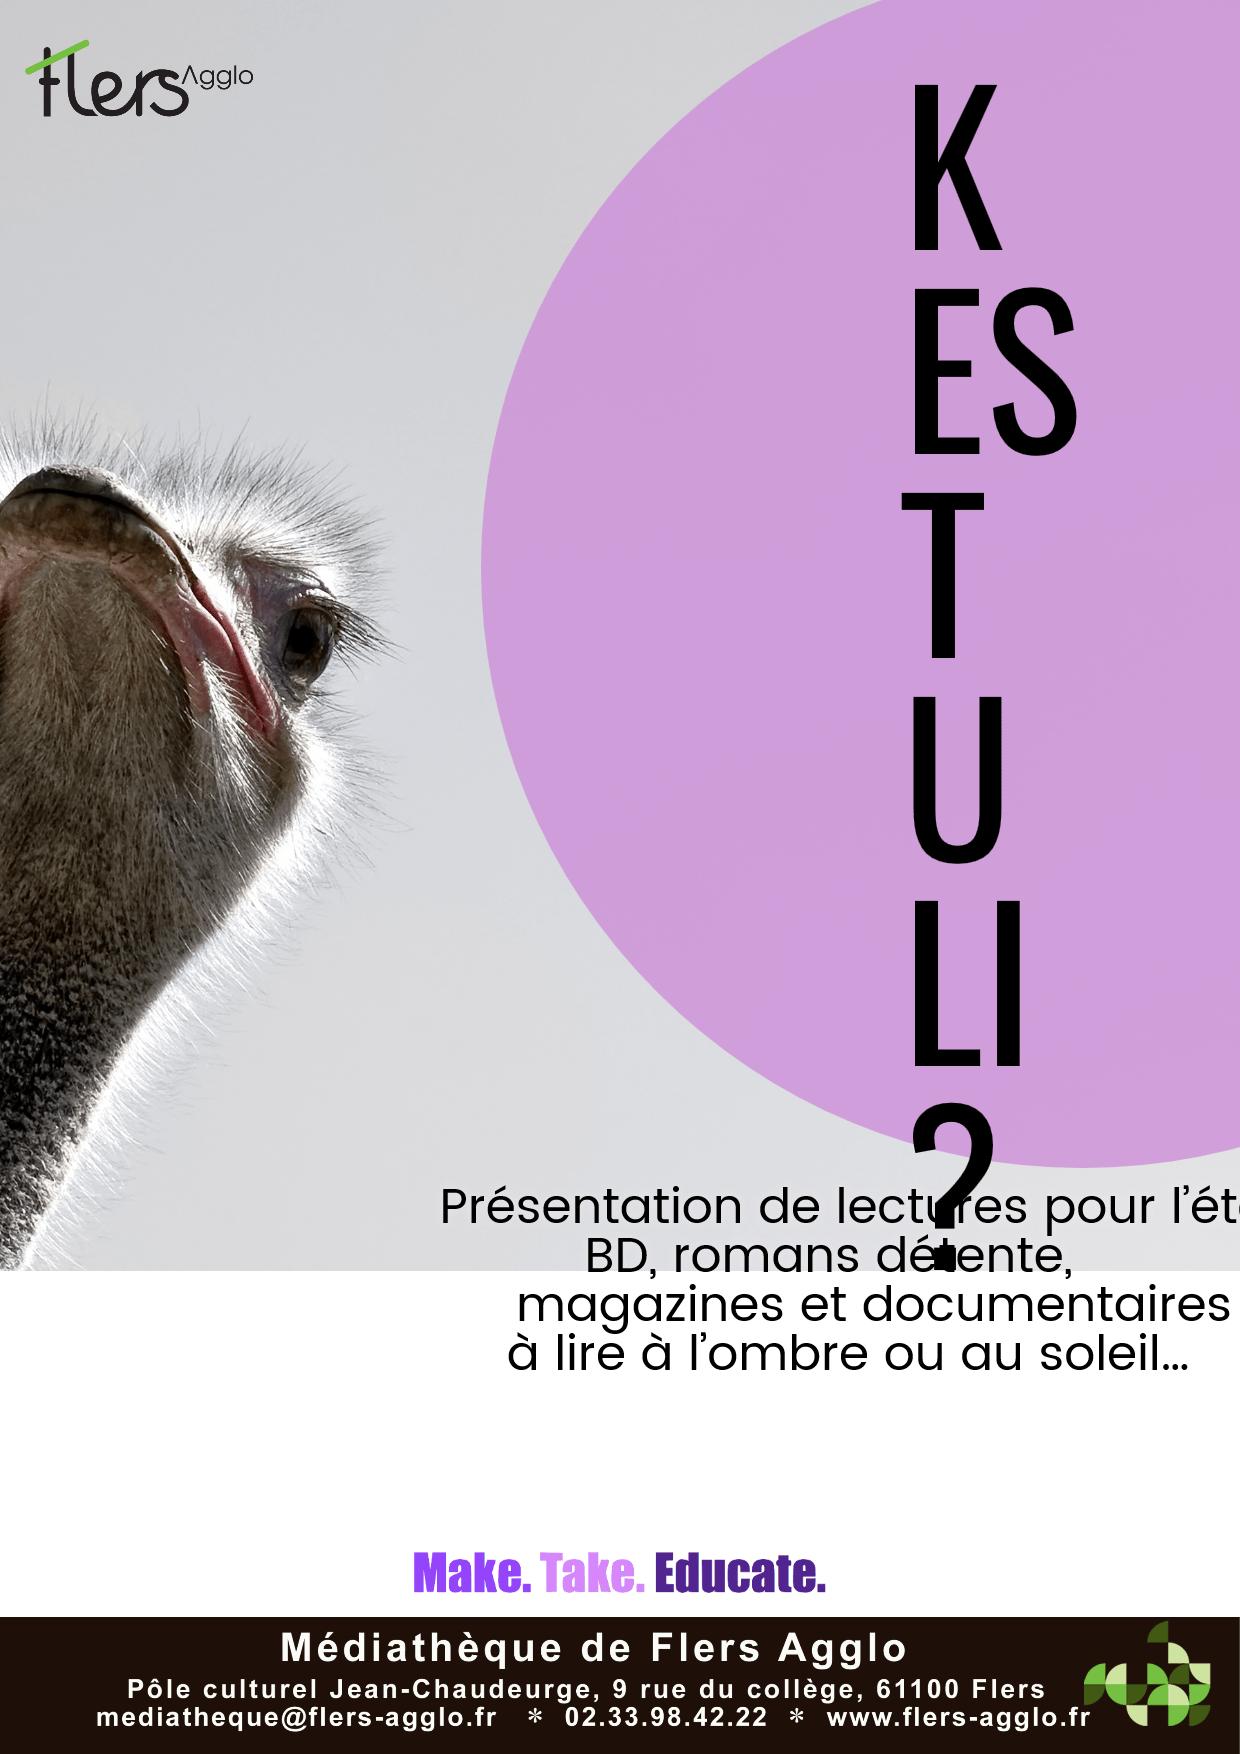 Purple,                Fauna,                Beak,                Advertising,                Poster,                Photo,                Caption,                Snout,                Organism,                Font,                Funny,                White,                Black,                 Free Image